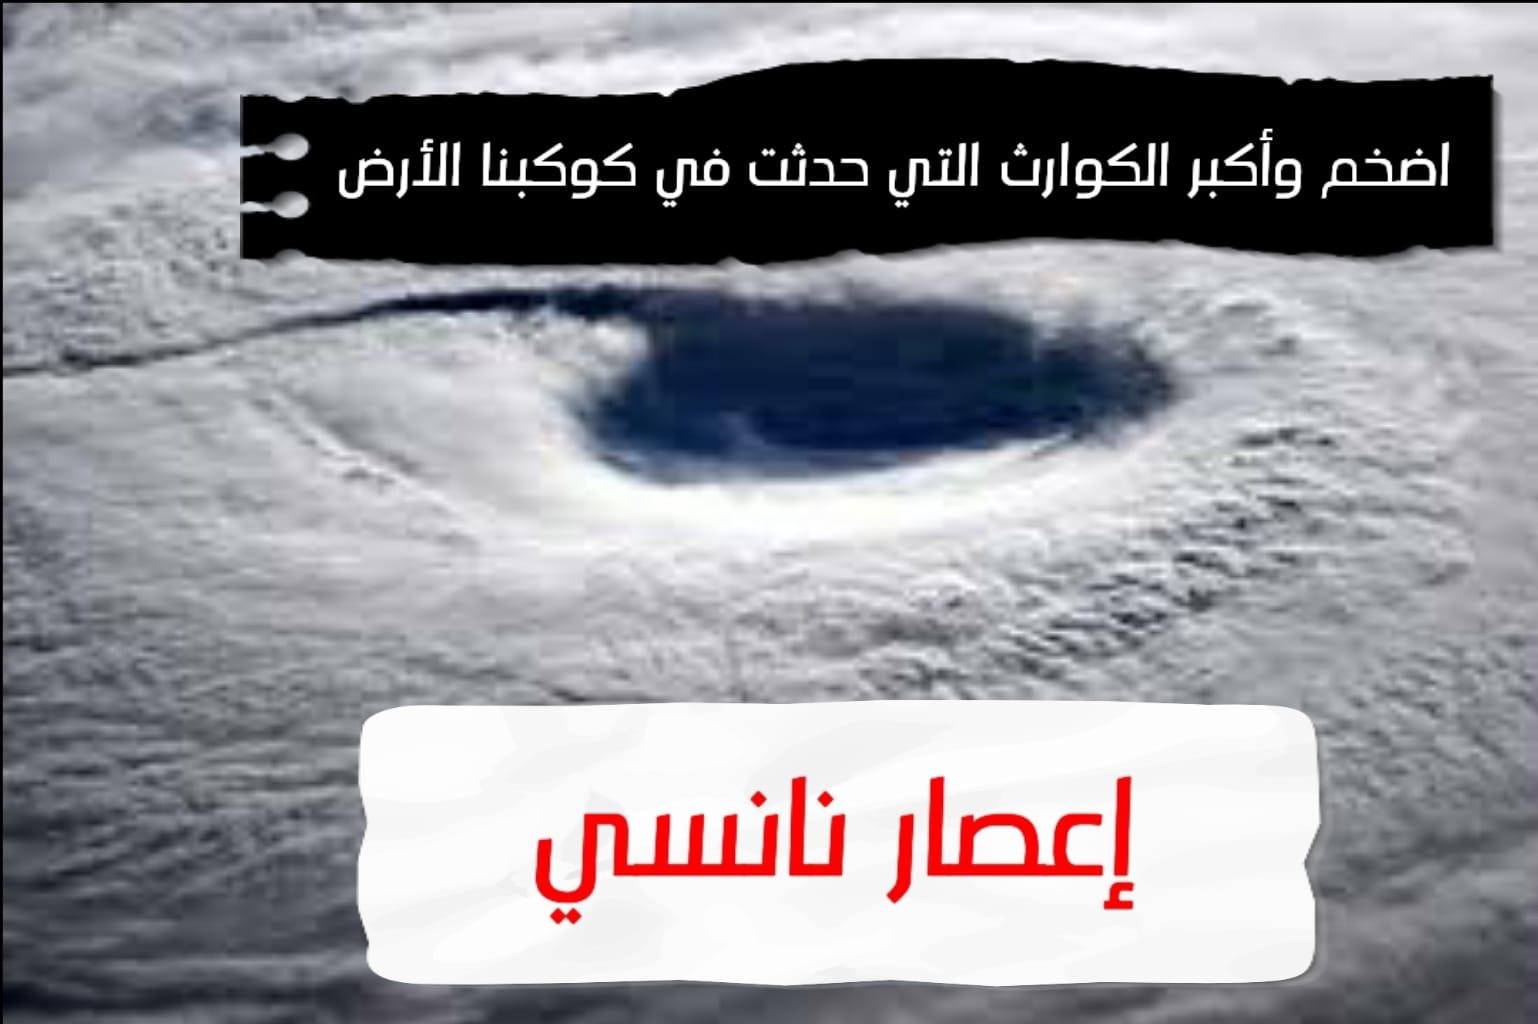 WhatsApp Image 2020 06 18 at 12.48.18 AM - أكبر 3 كوارث طبيعية مسجلة على الإطلاق من حيث الطاقة